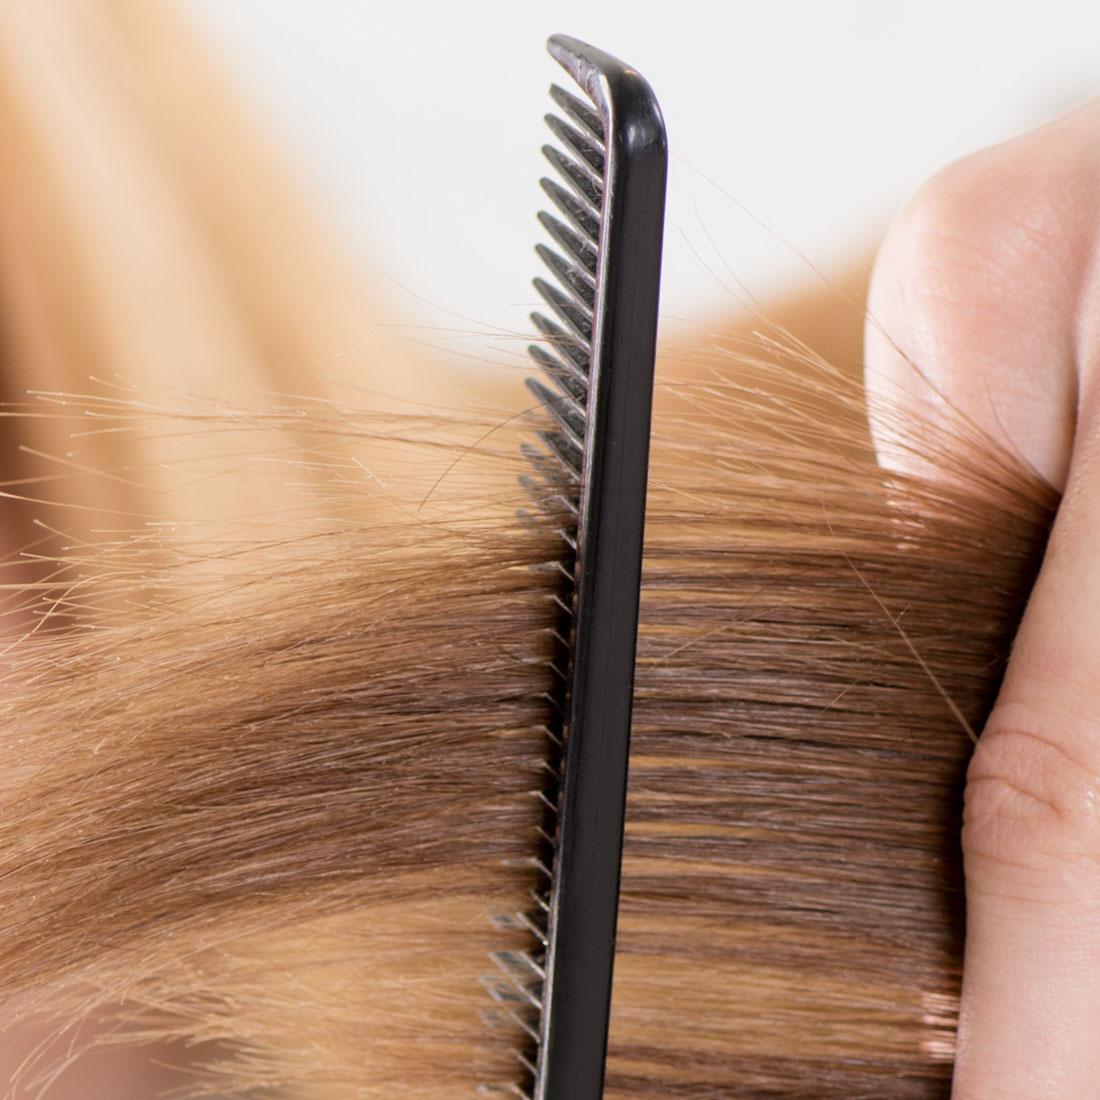 Getting ready to trim a women's hair